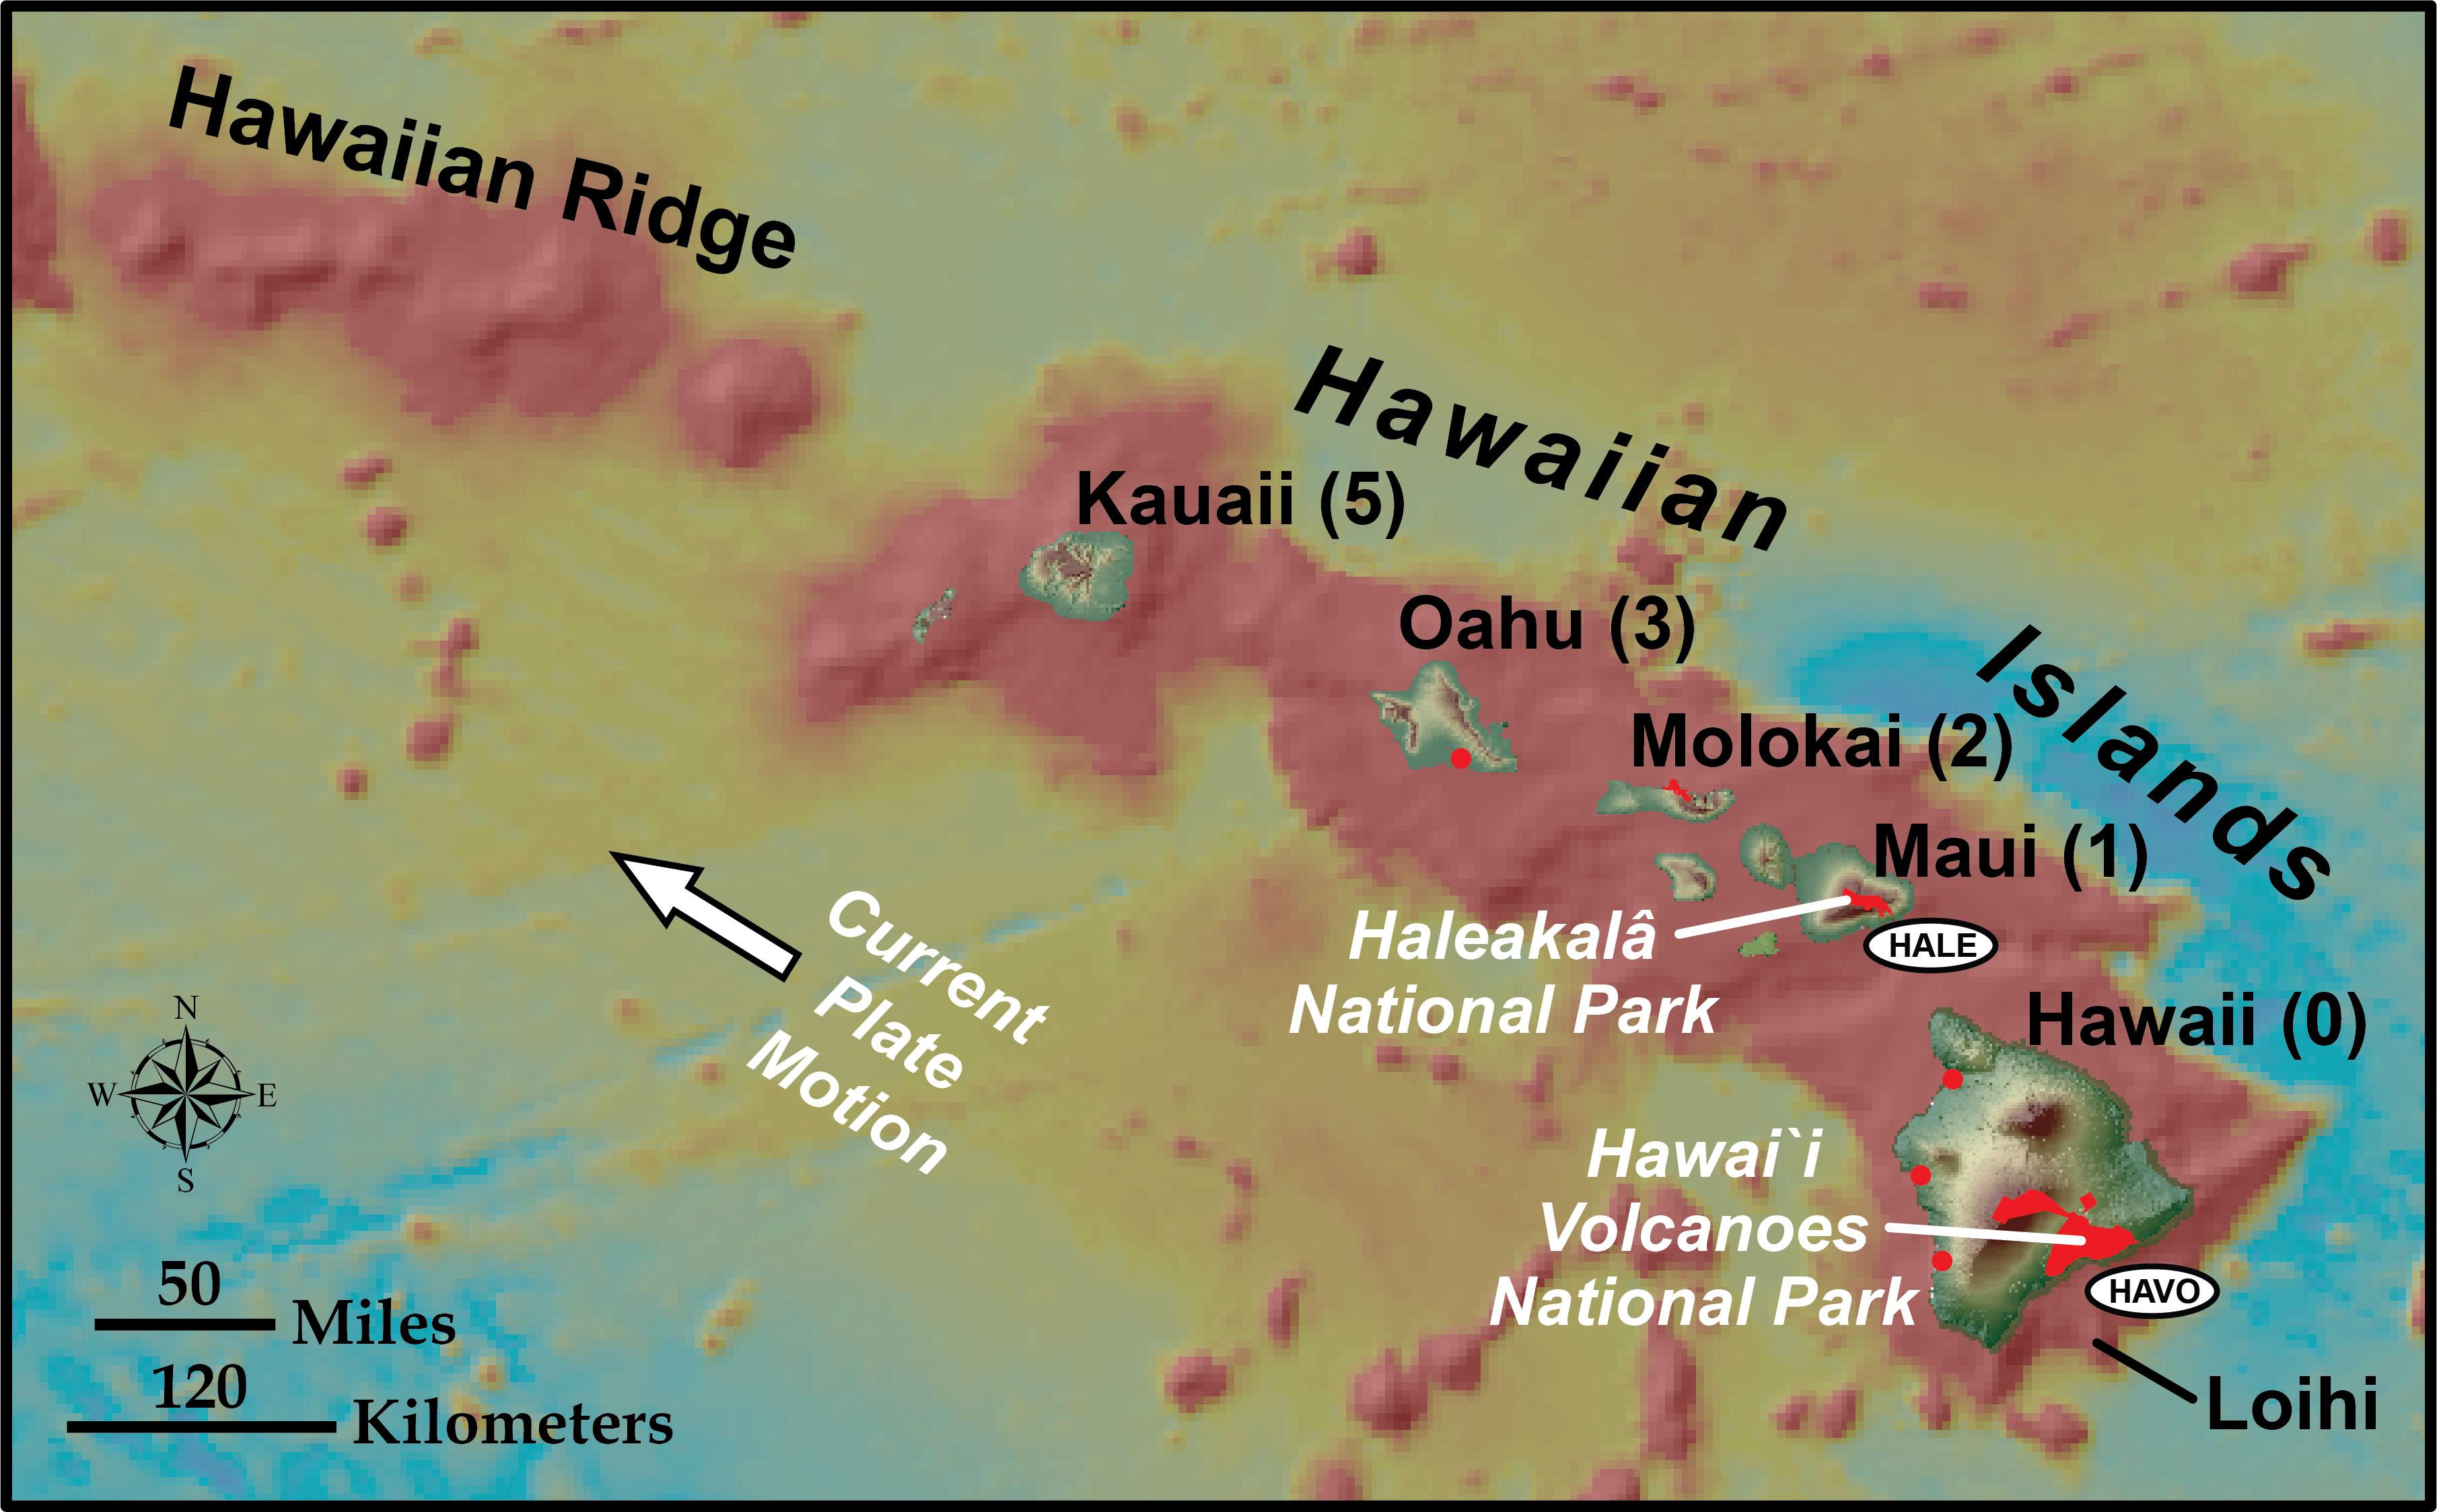 Oceanic Hotspots Geology U S National Park Service